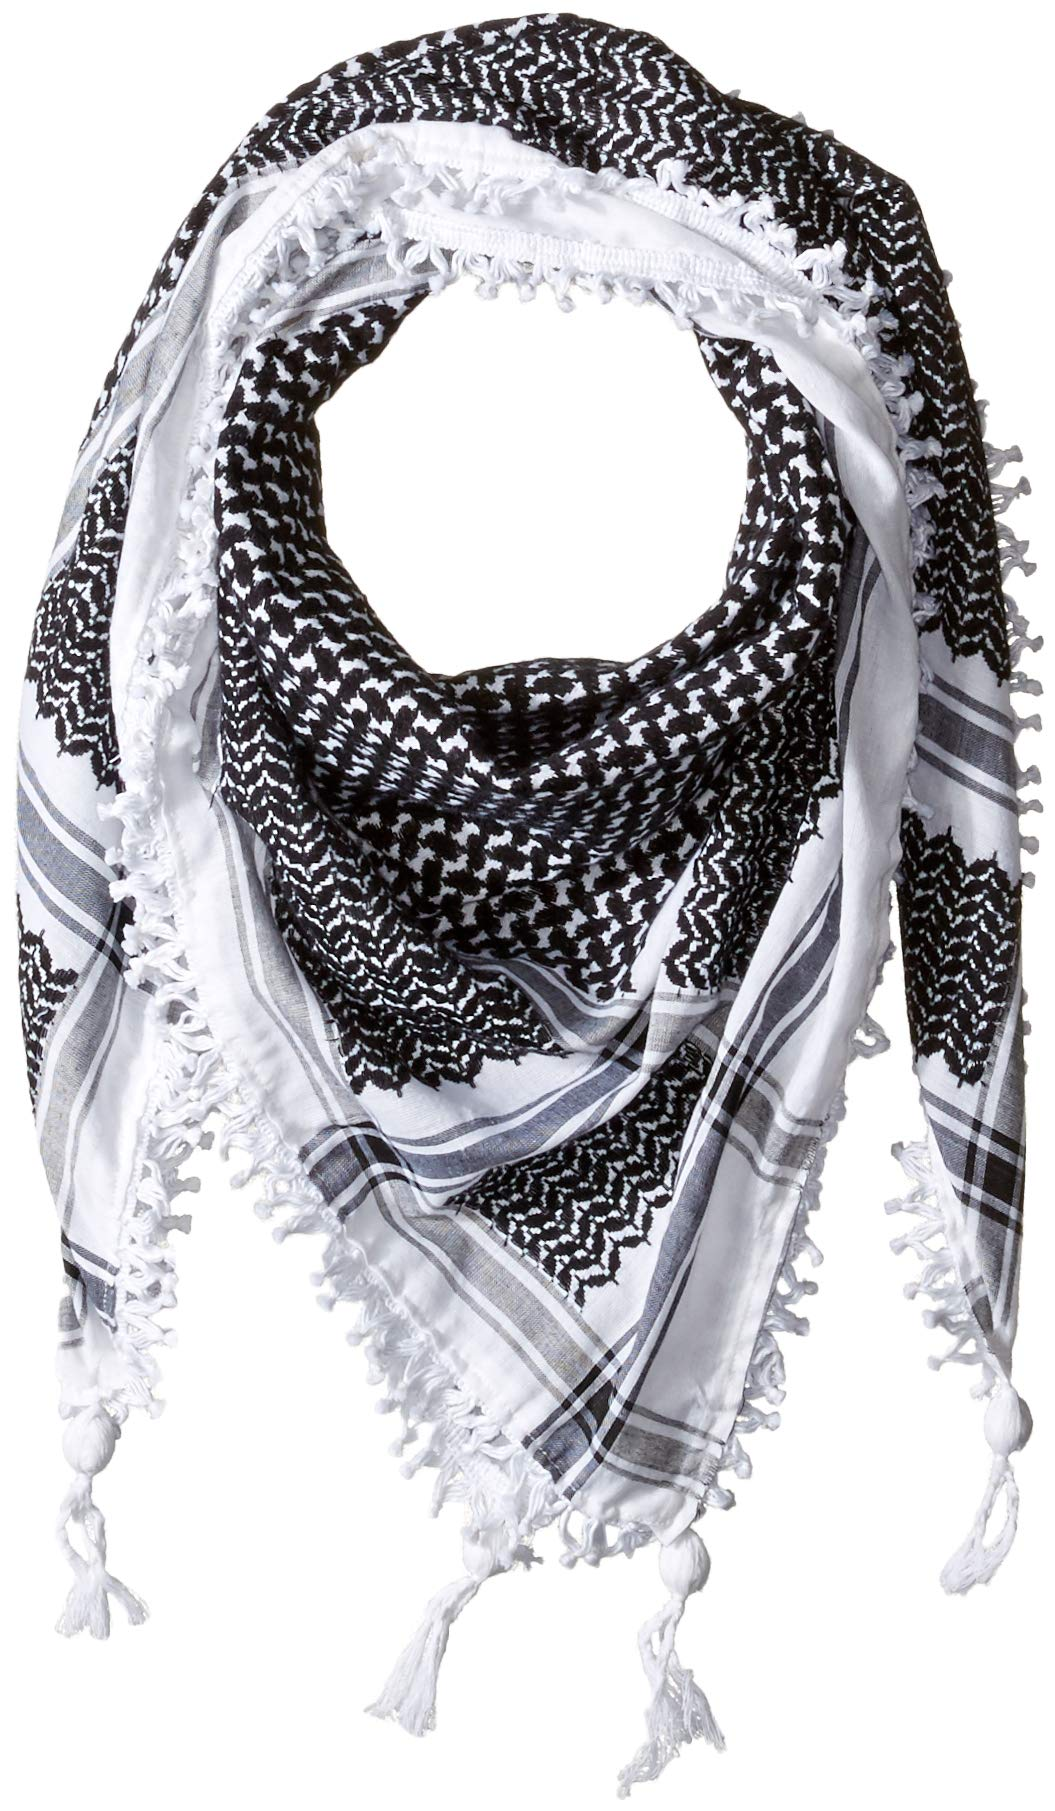 Hirbawi Premium Arabic Scarf 100/% Cotton Shemagh Keffiyeh 47x47 Arab Scarf Made in Palestine